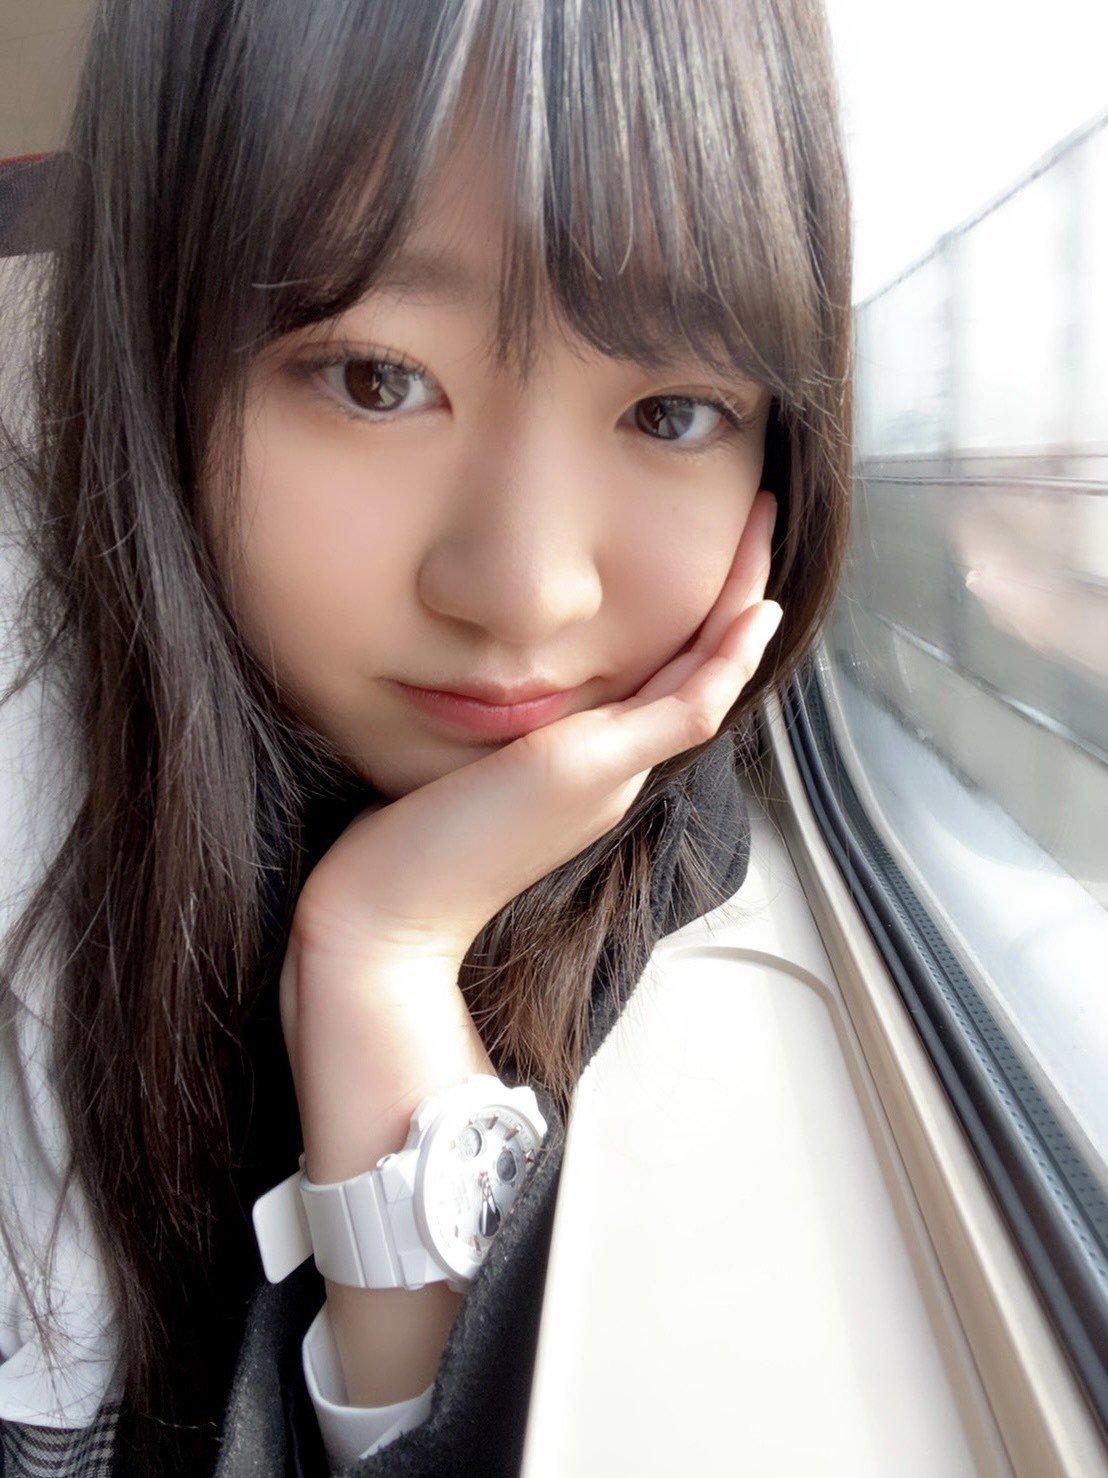 Nakayama%20Natsume-977080.jpg